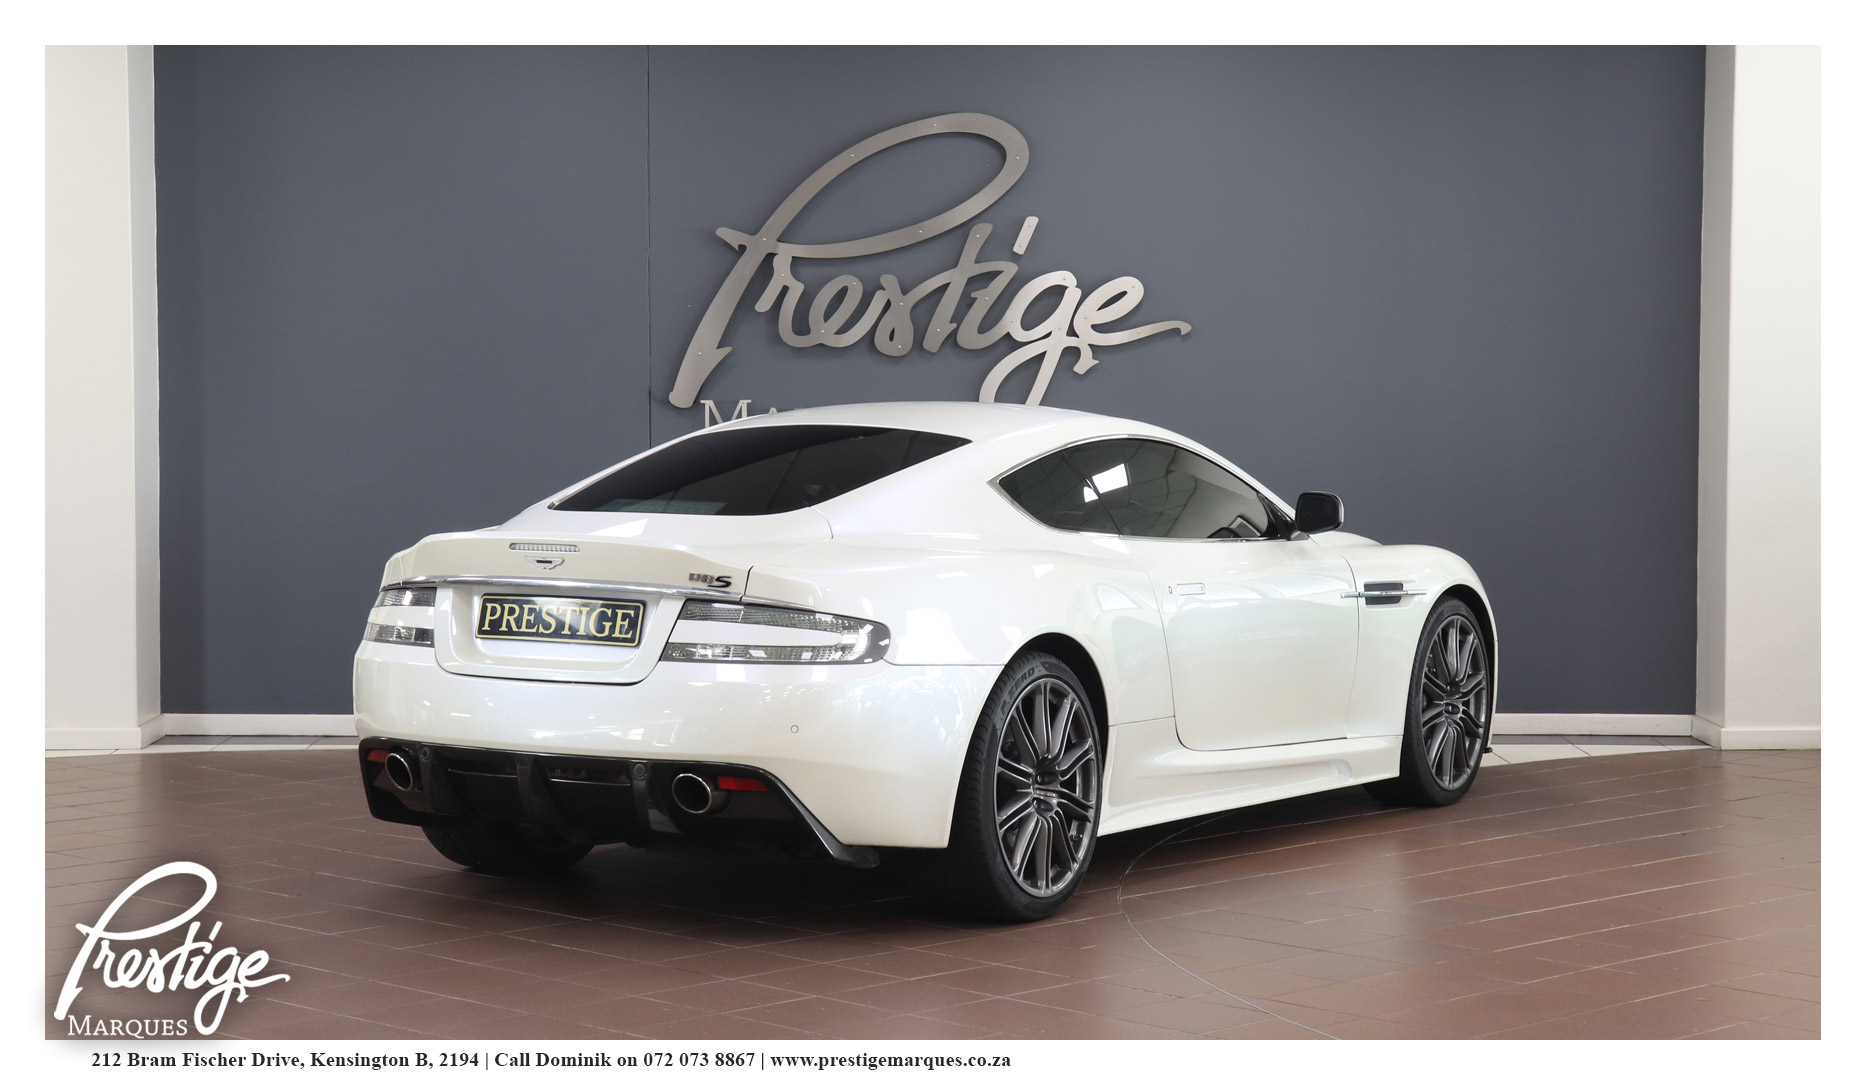 Aston-Martin-DBS-Coupe-Auto-2009-Prestige-Marques-Randburg-Sandton-4